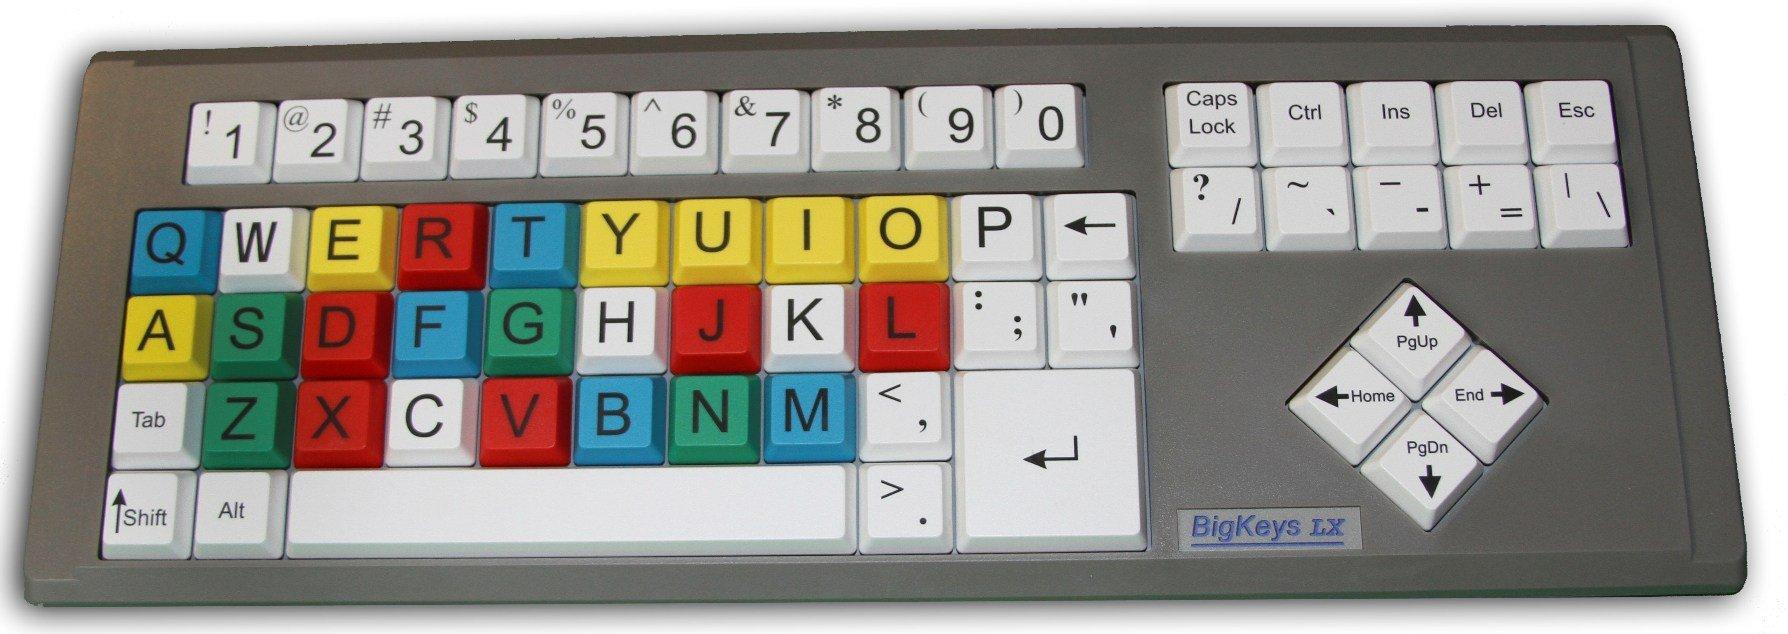 Greystone BigKeys LX Kids Keyboard, Qwerty layout